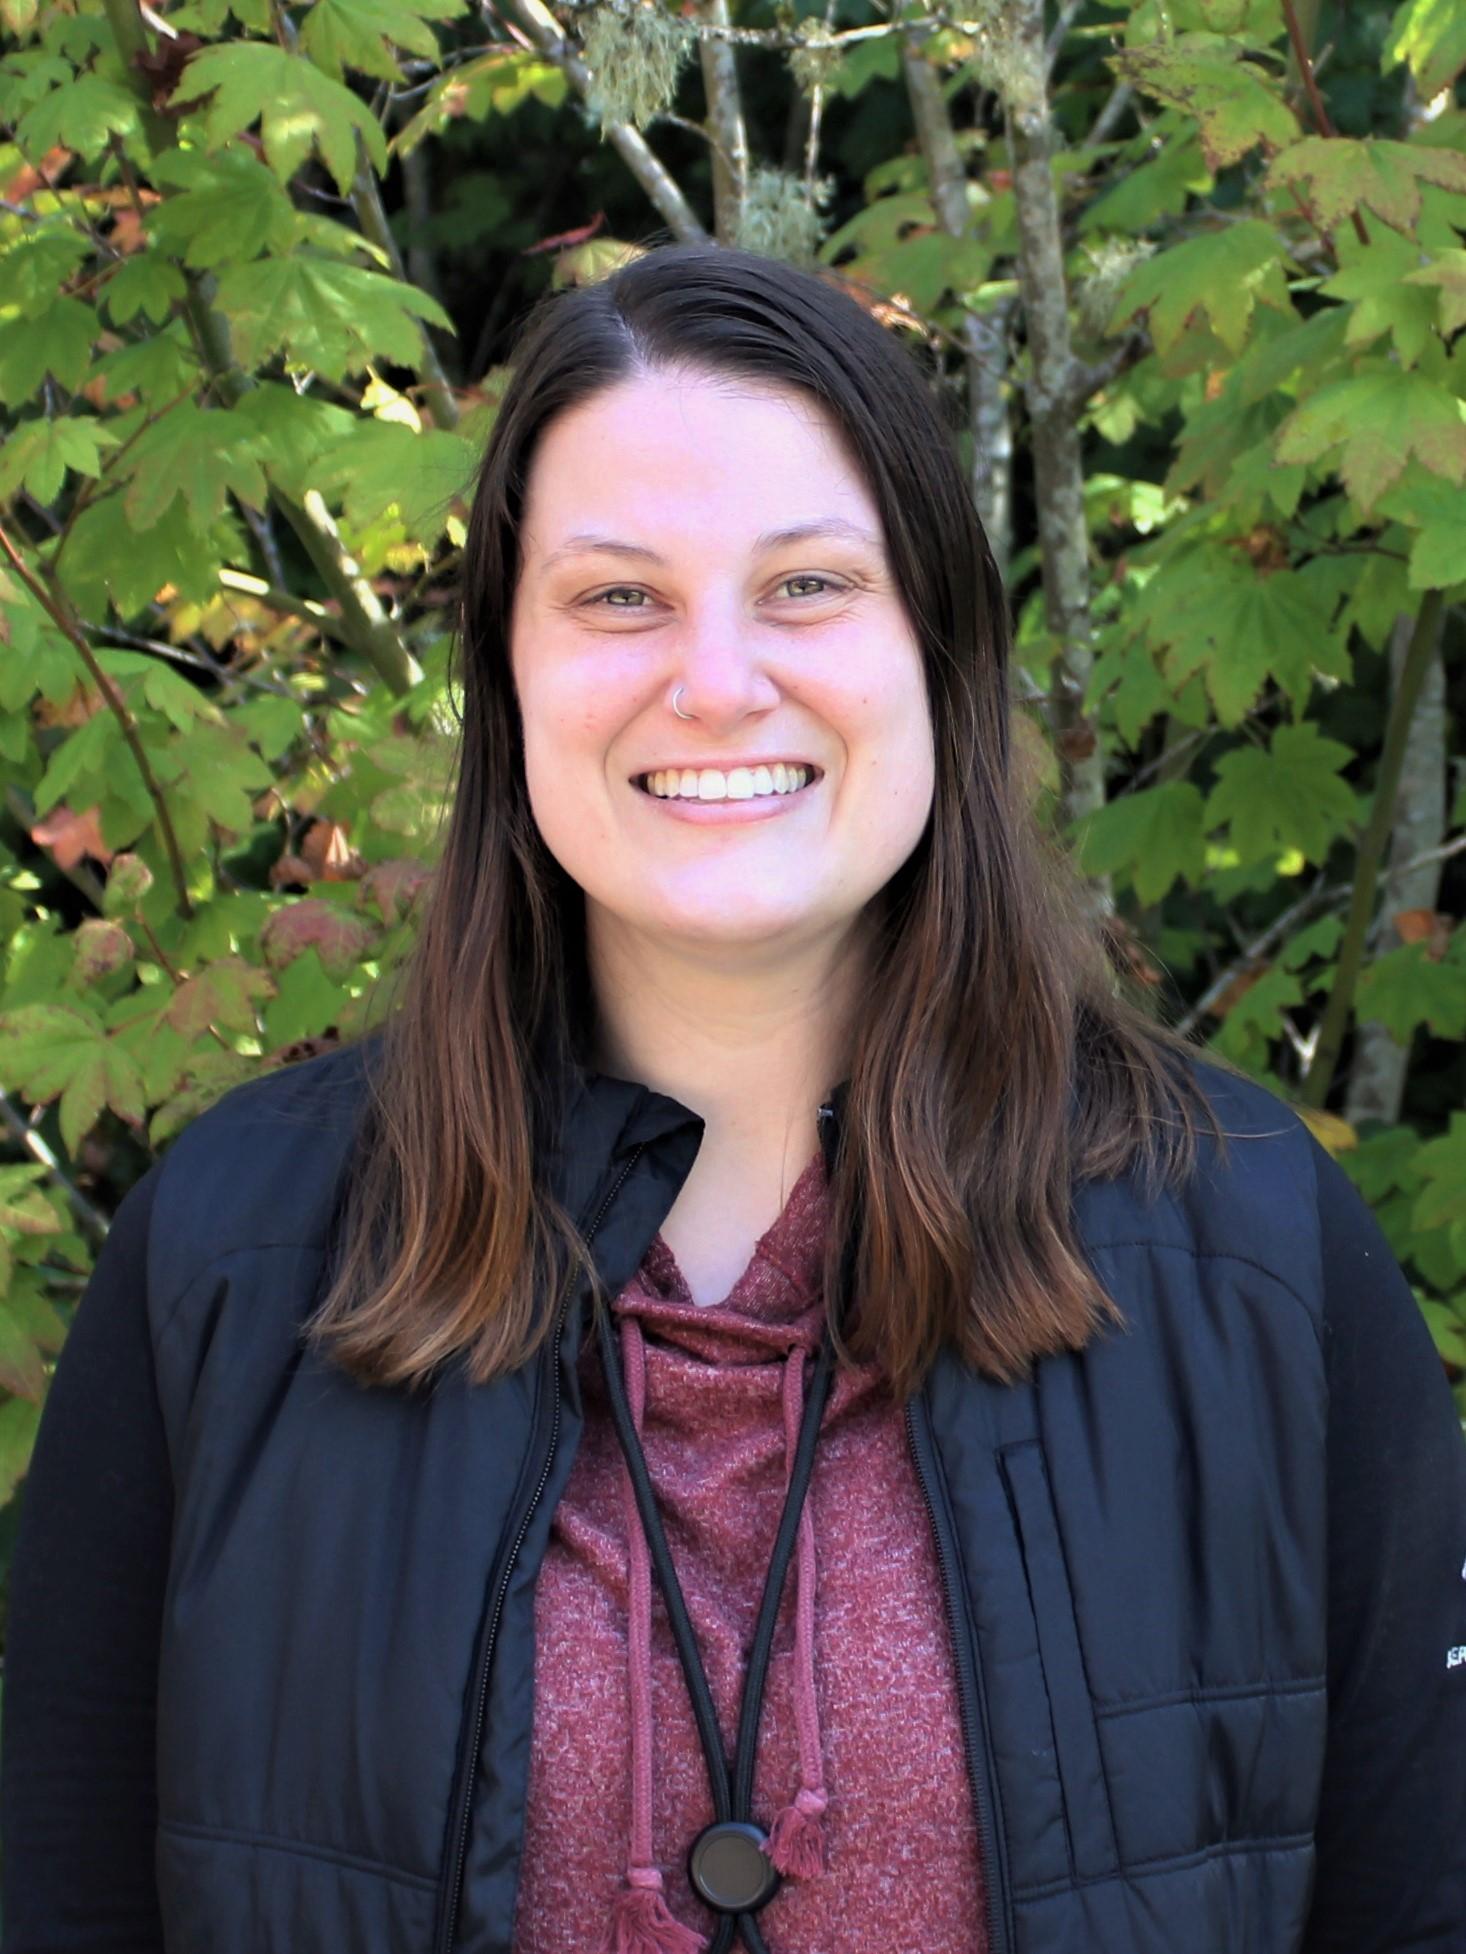 IslandWood Graduate Program student Diana Krichevsky